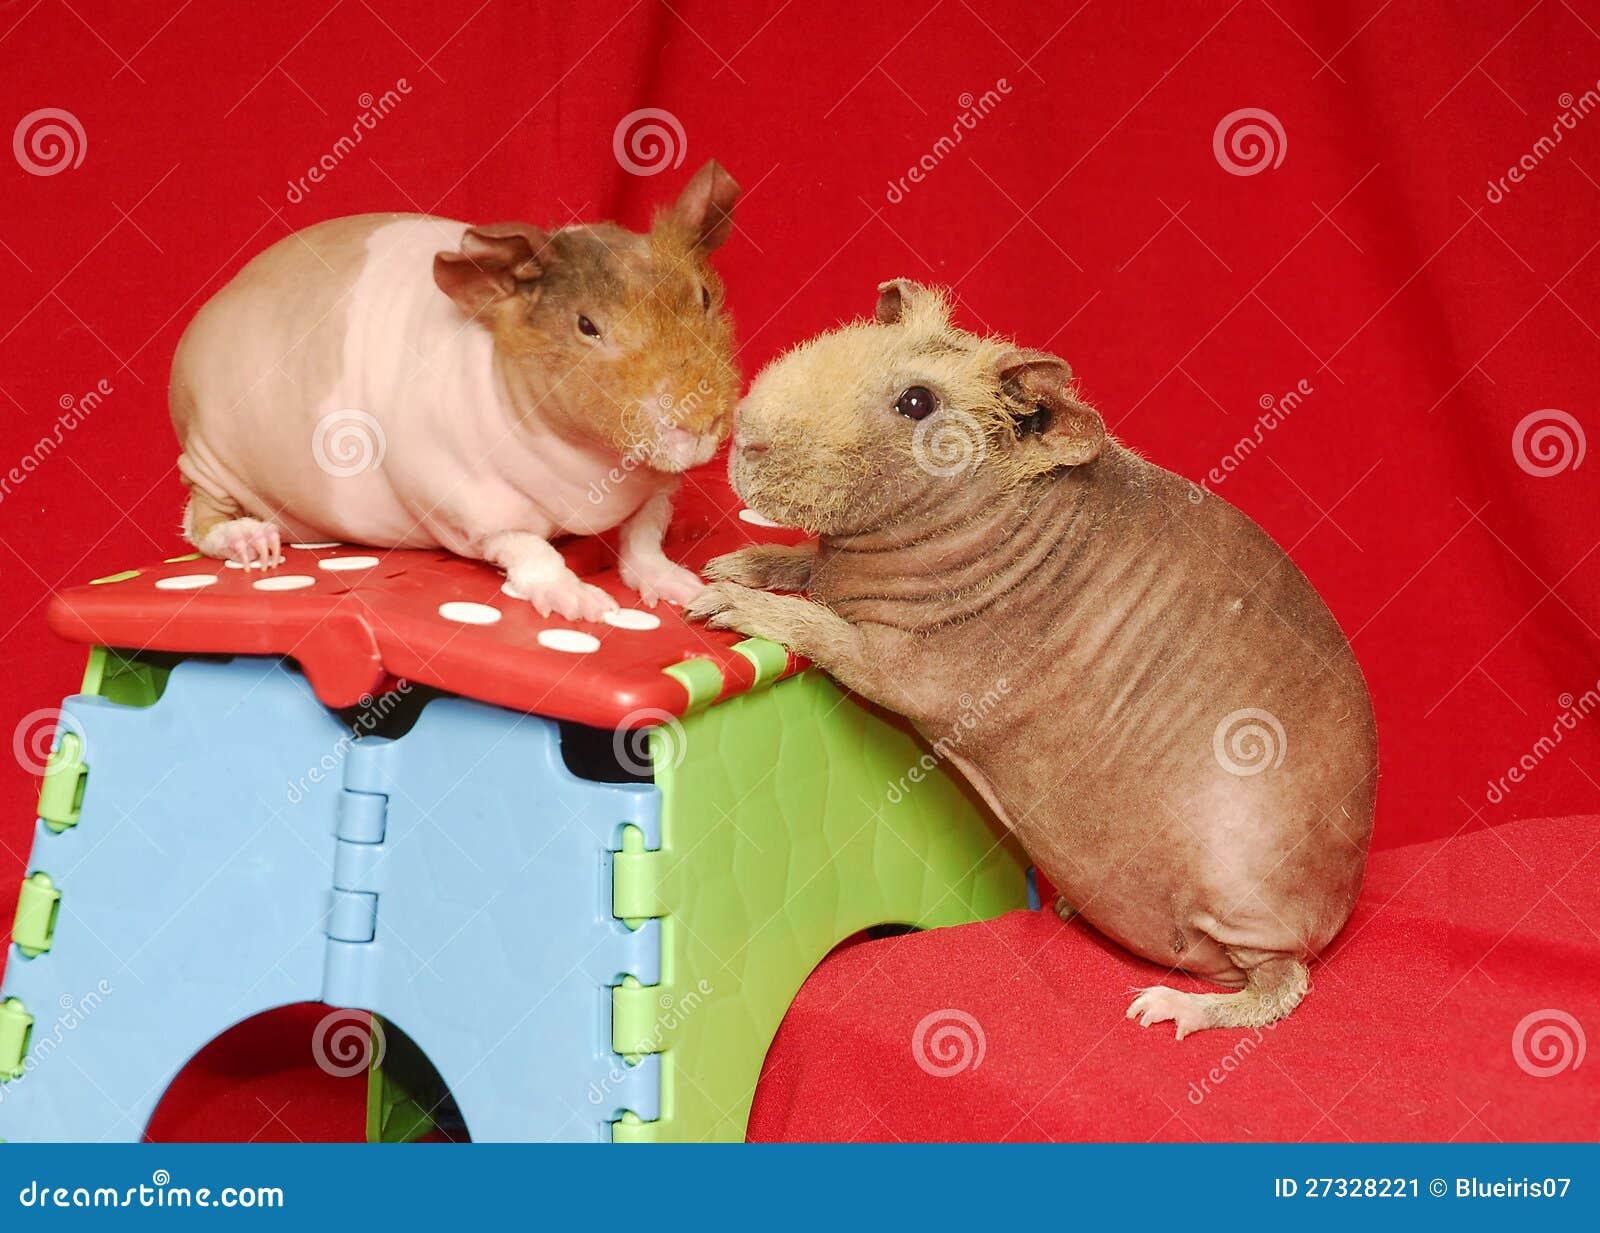 Imagen de archivo: Dos cerdos flacos